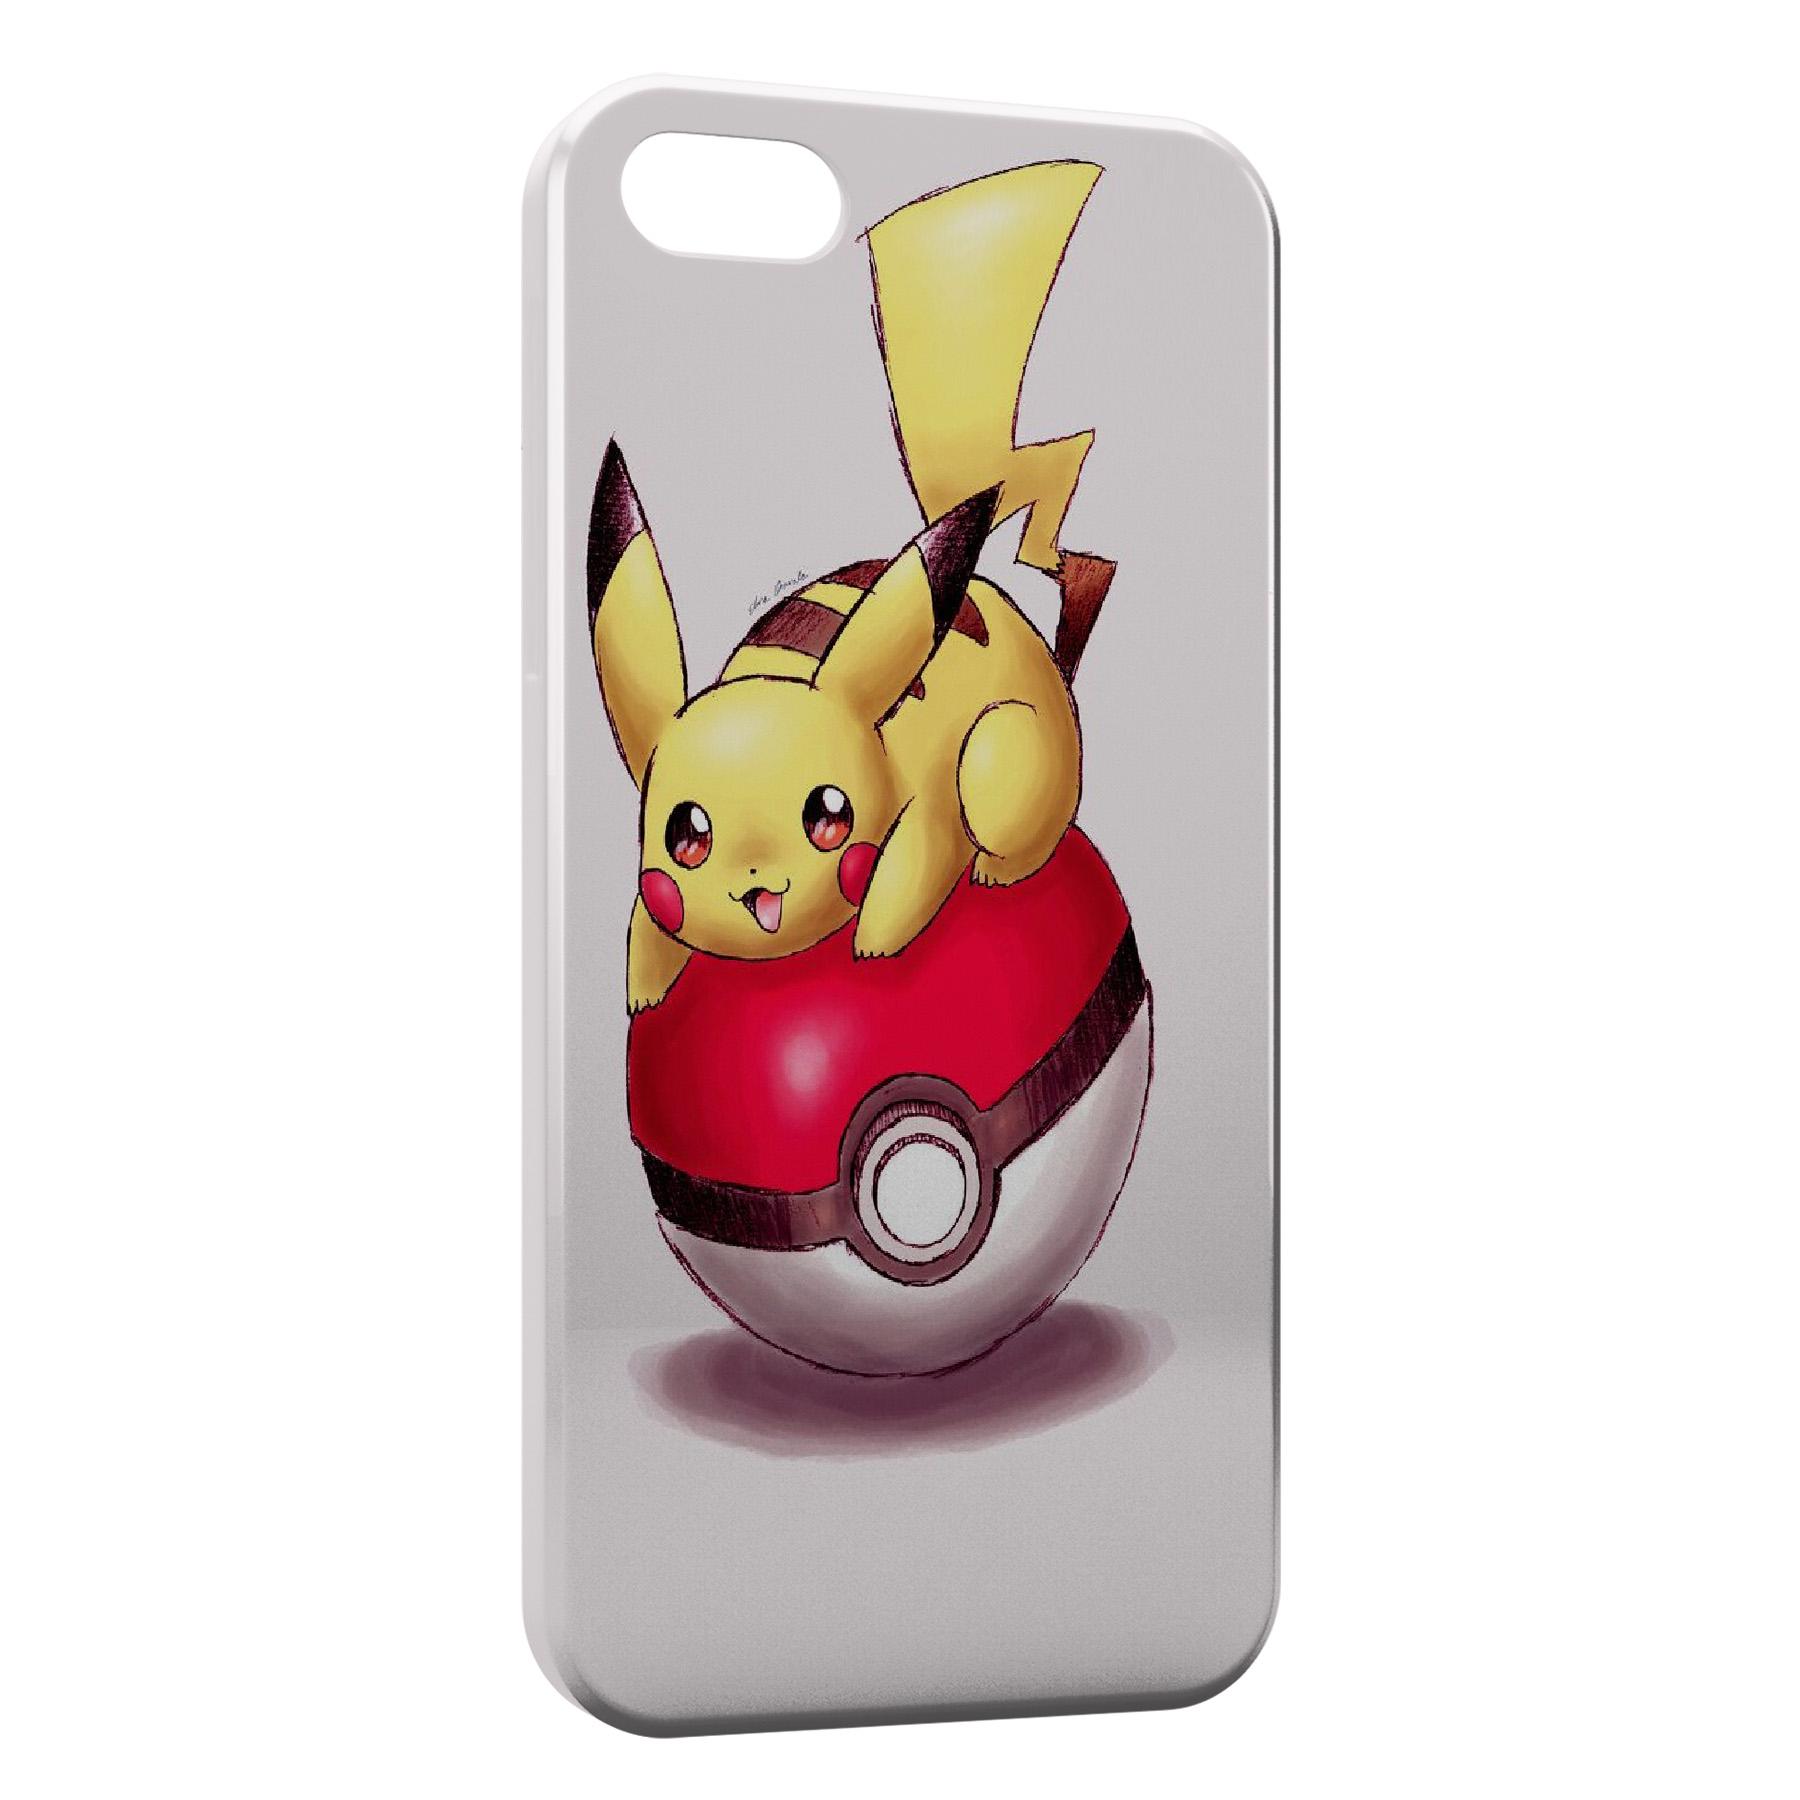 Coque iPhone 6 6S Pikachu Pokeball Pokemon Dessin